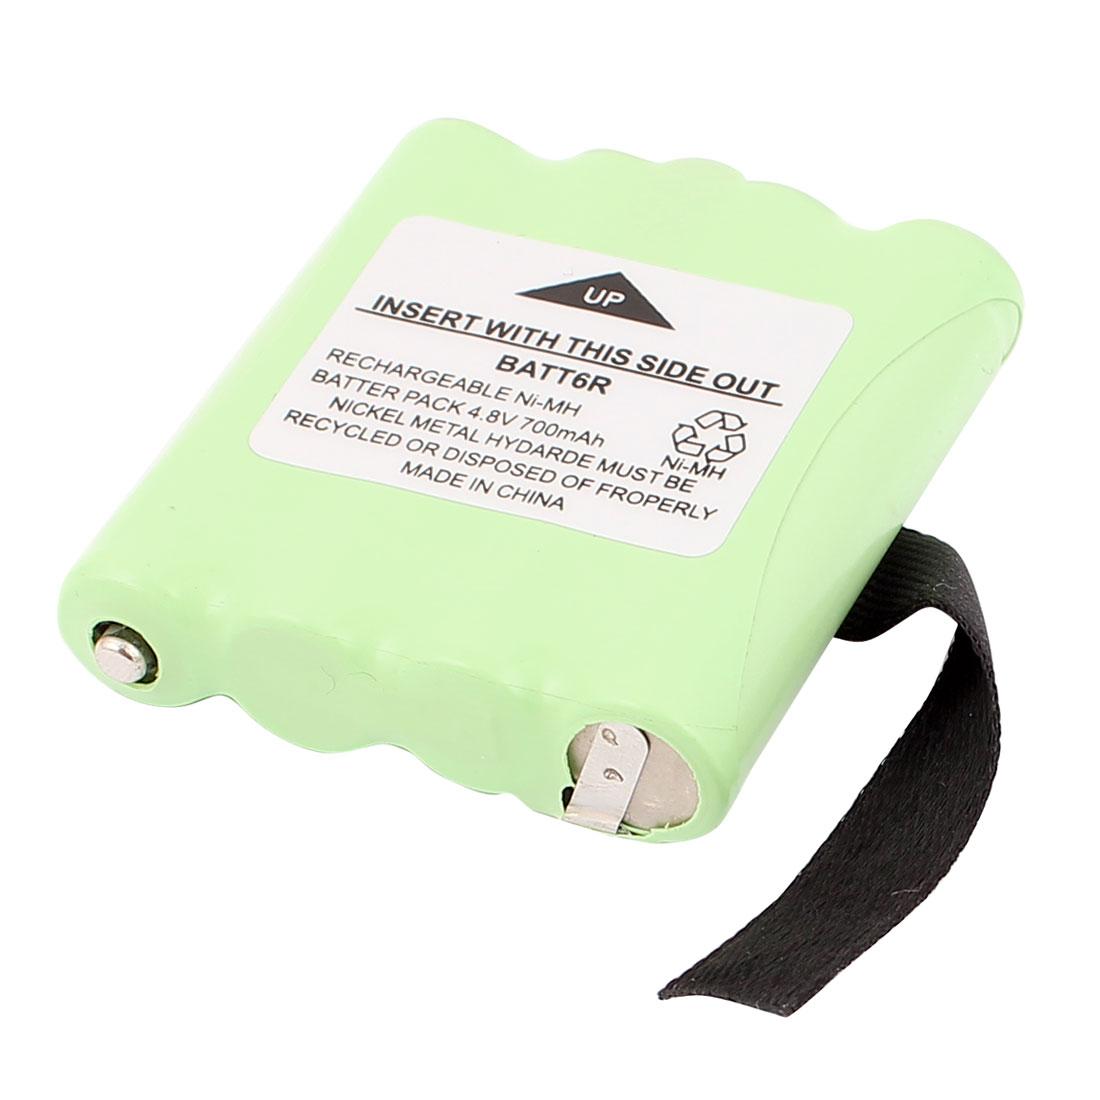 BATT6R 700mAh 4.8V Rechargeable Ni-MH Battery Green for Cordless Walkie Talkie